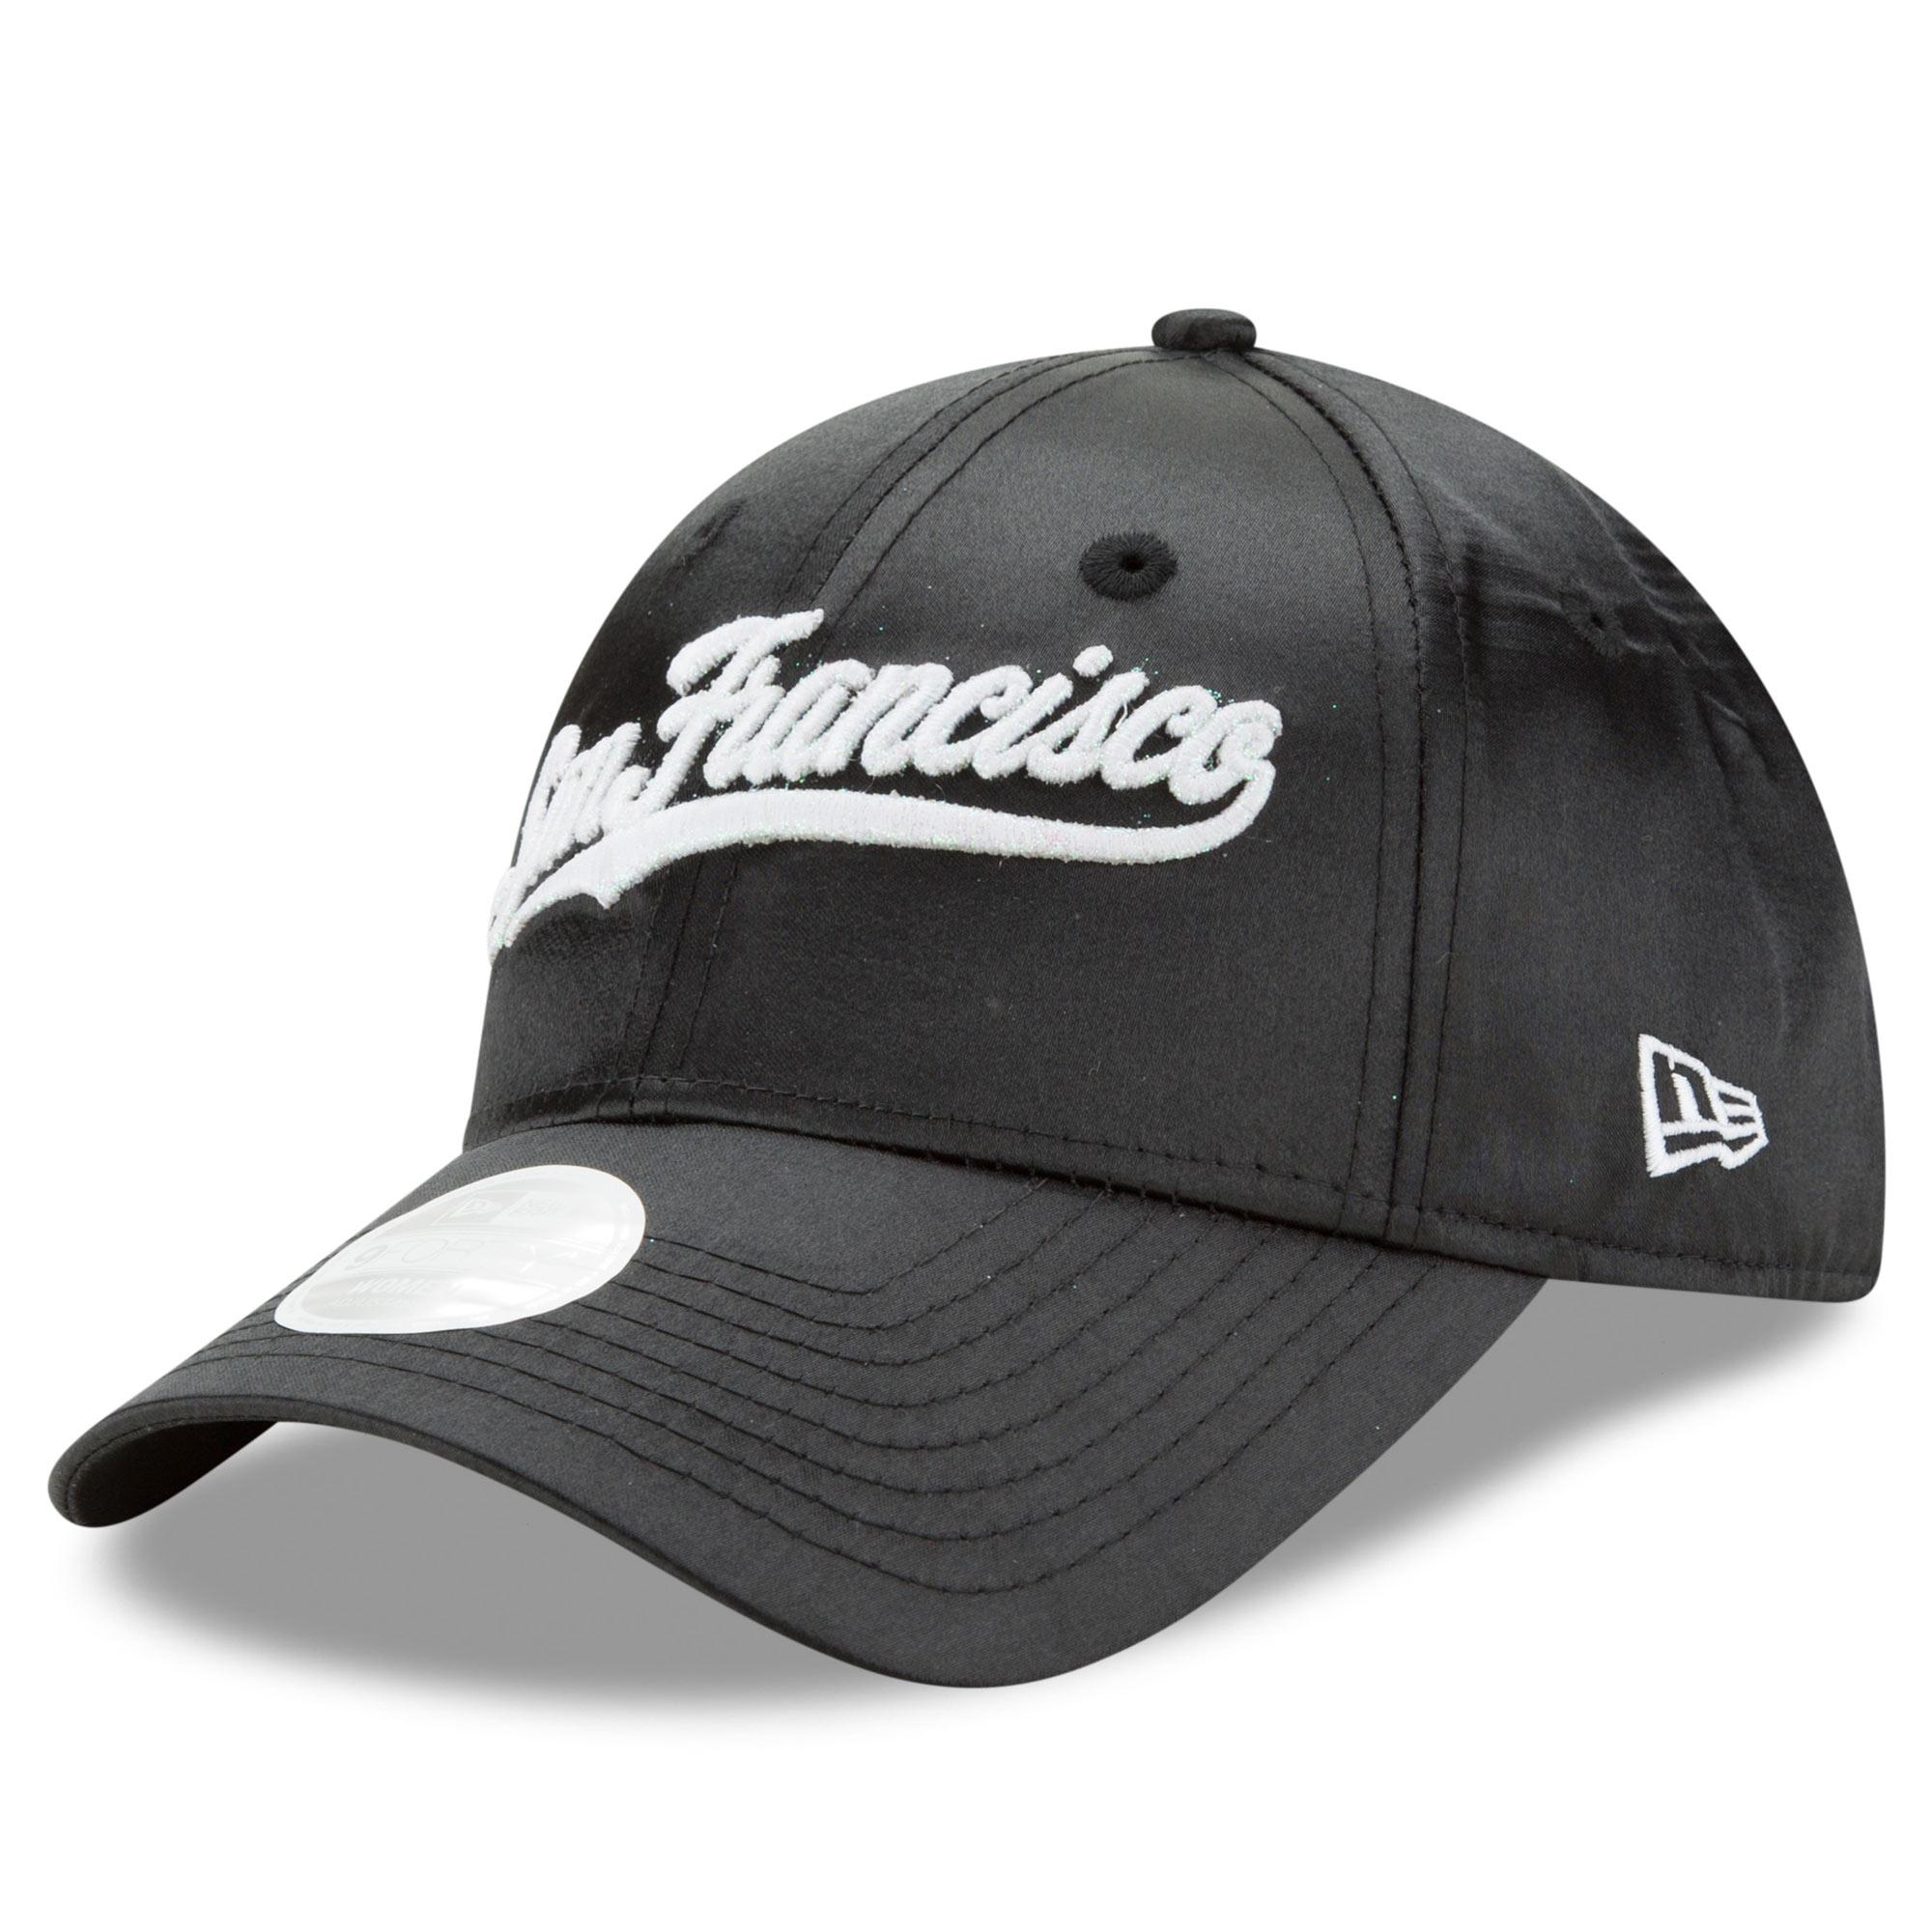 San Francisco Giants New Era Women's Satin Team Charmer 9FORTY Adjustable Hat - Black - OSFA